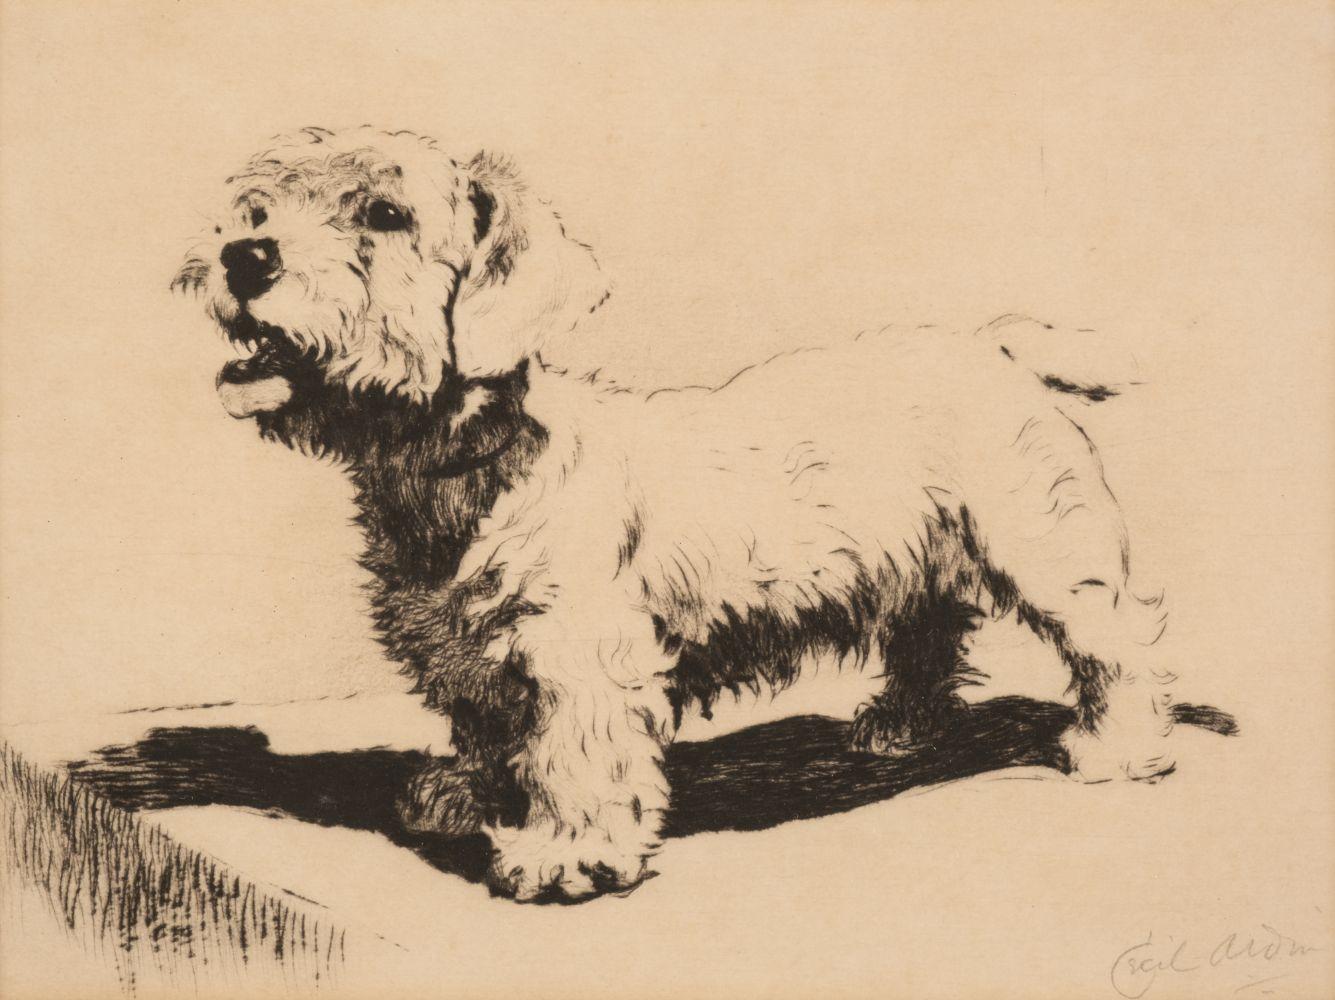 * Aldin (Cecil Charles Windsor, 1870 - 1935). Portrait of a Sealyham